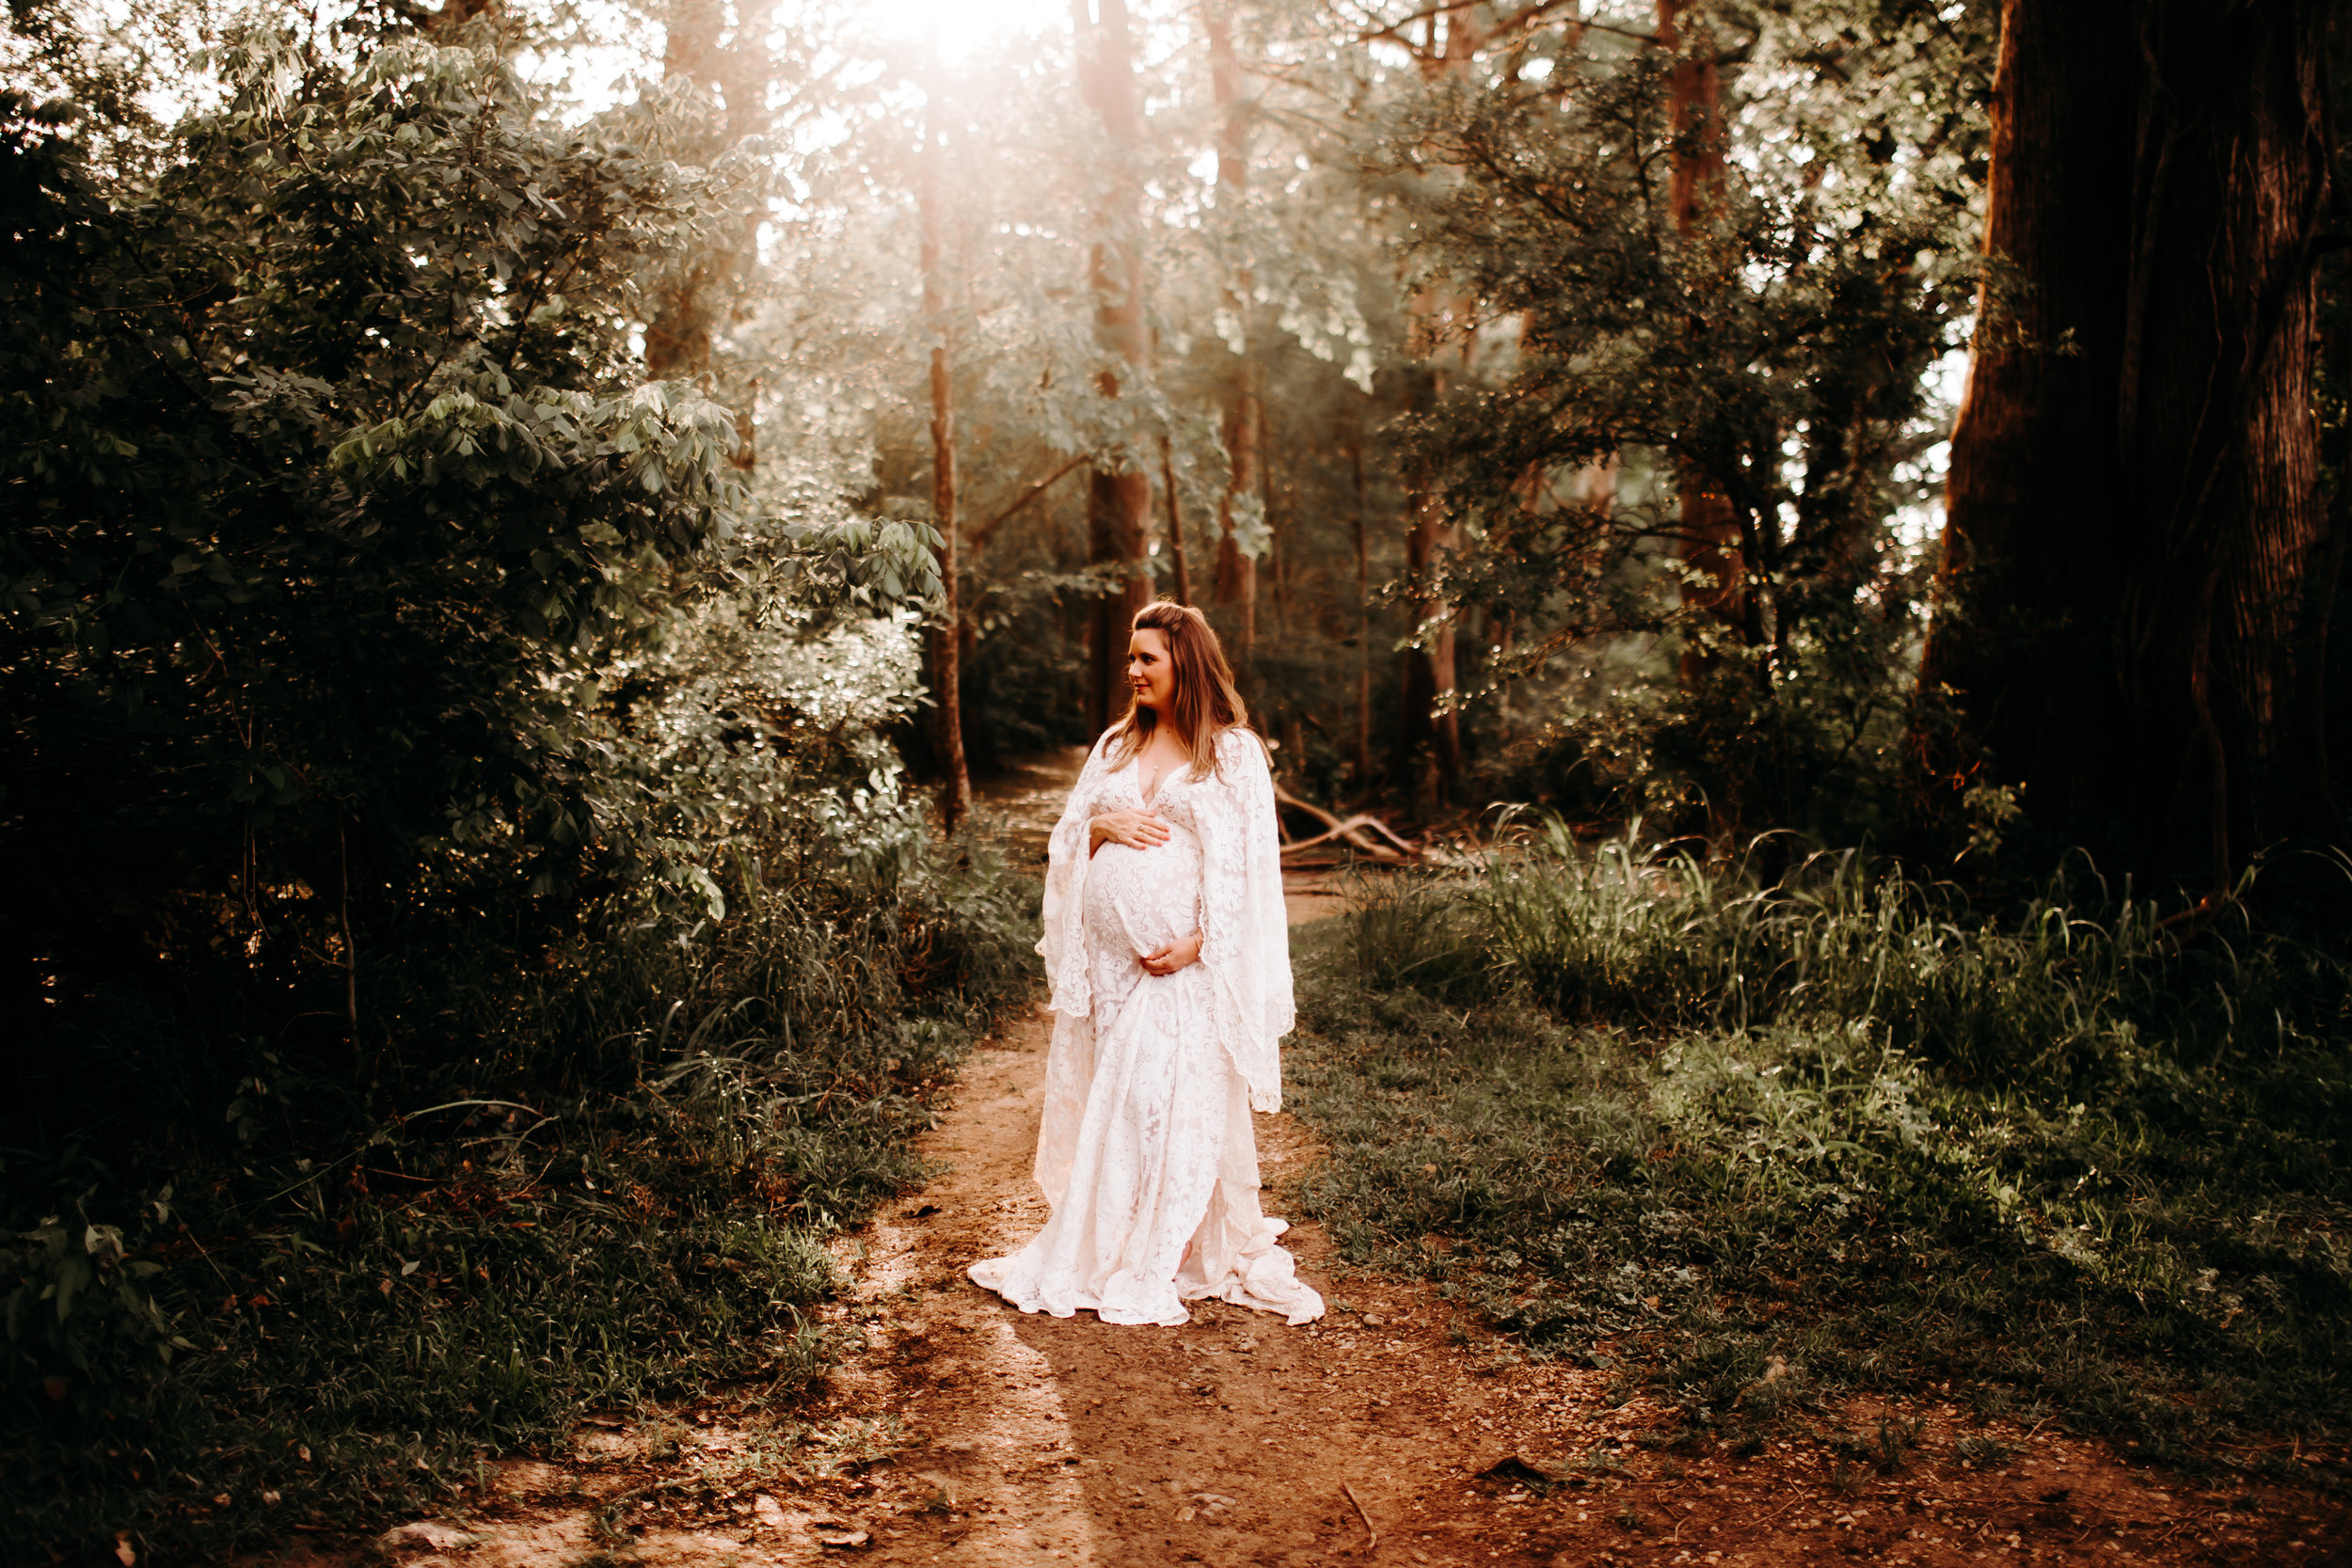 Alex-San-Antonio-Maternity-Photographer-26.jpg